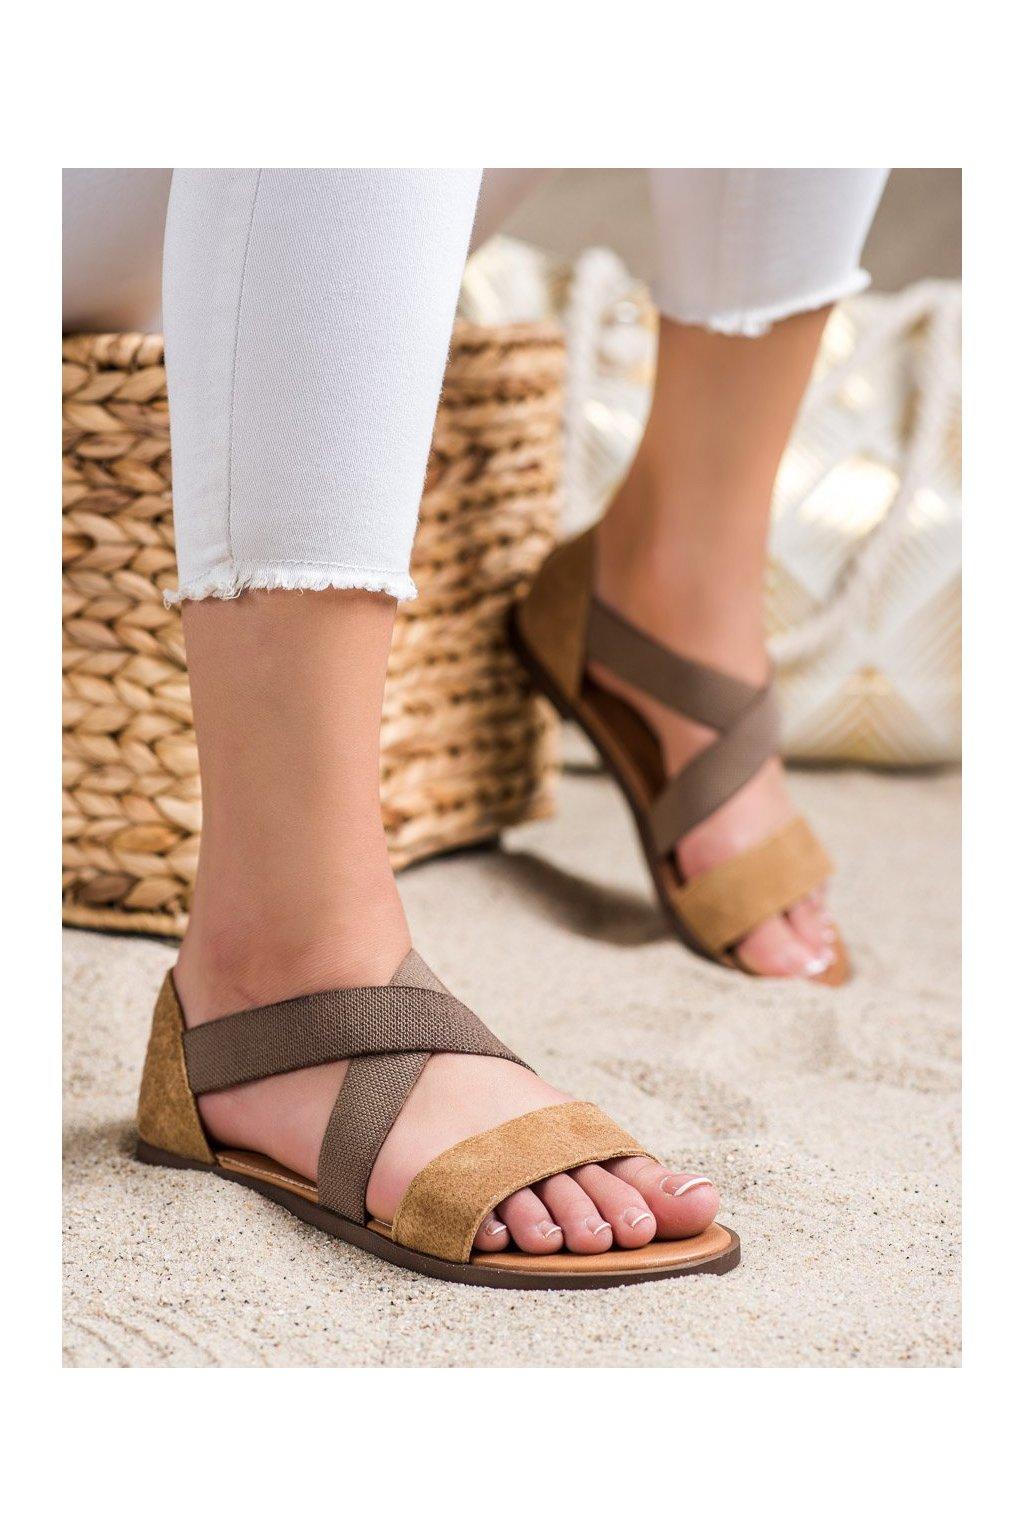 Hnedé sandále Sergio leone kod SK061BE